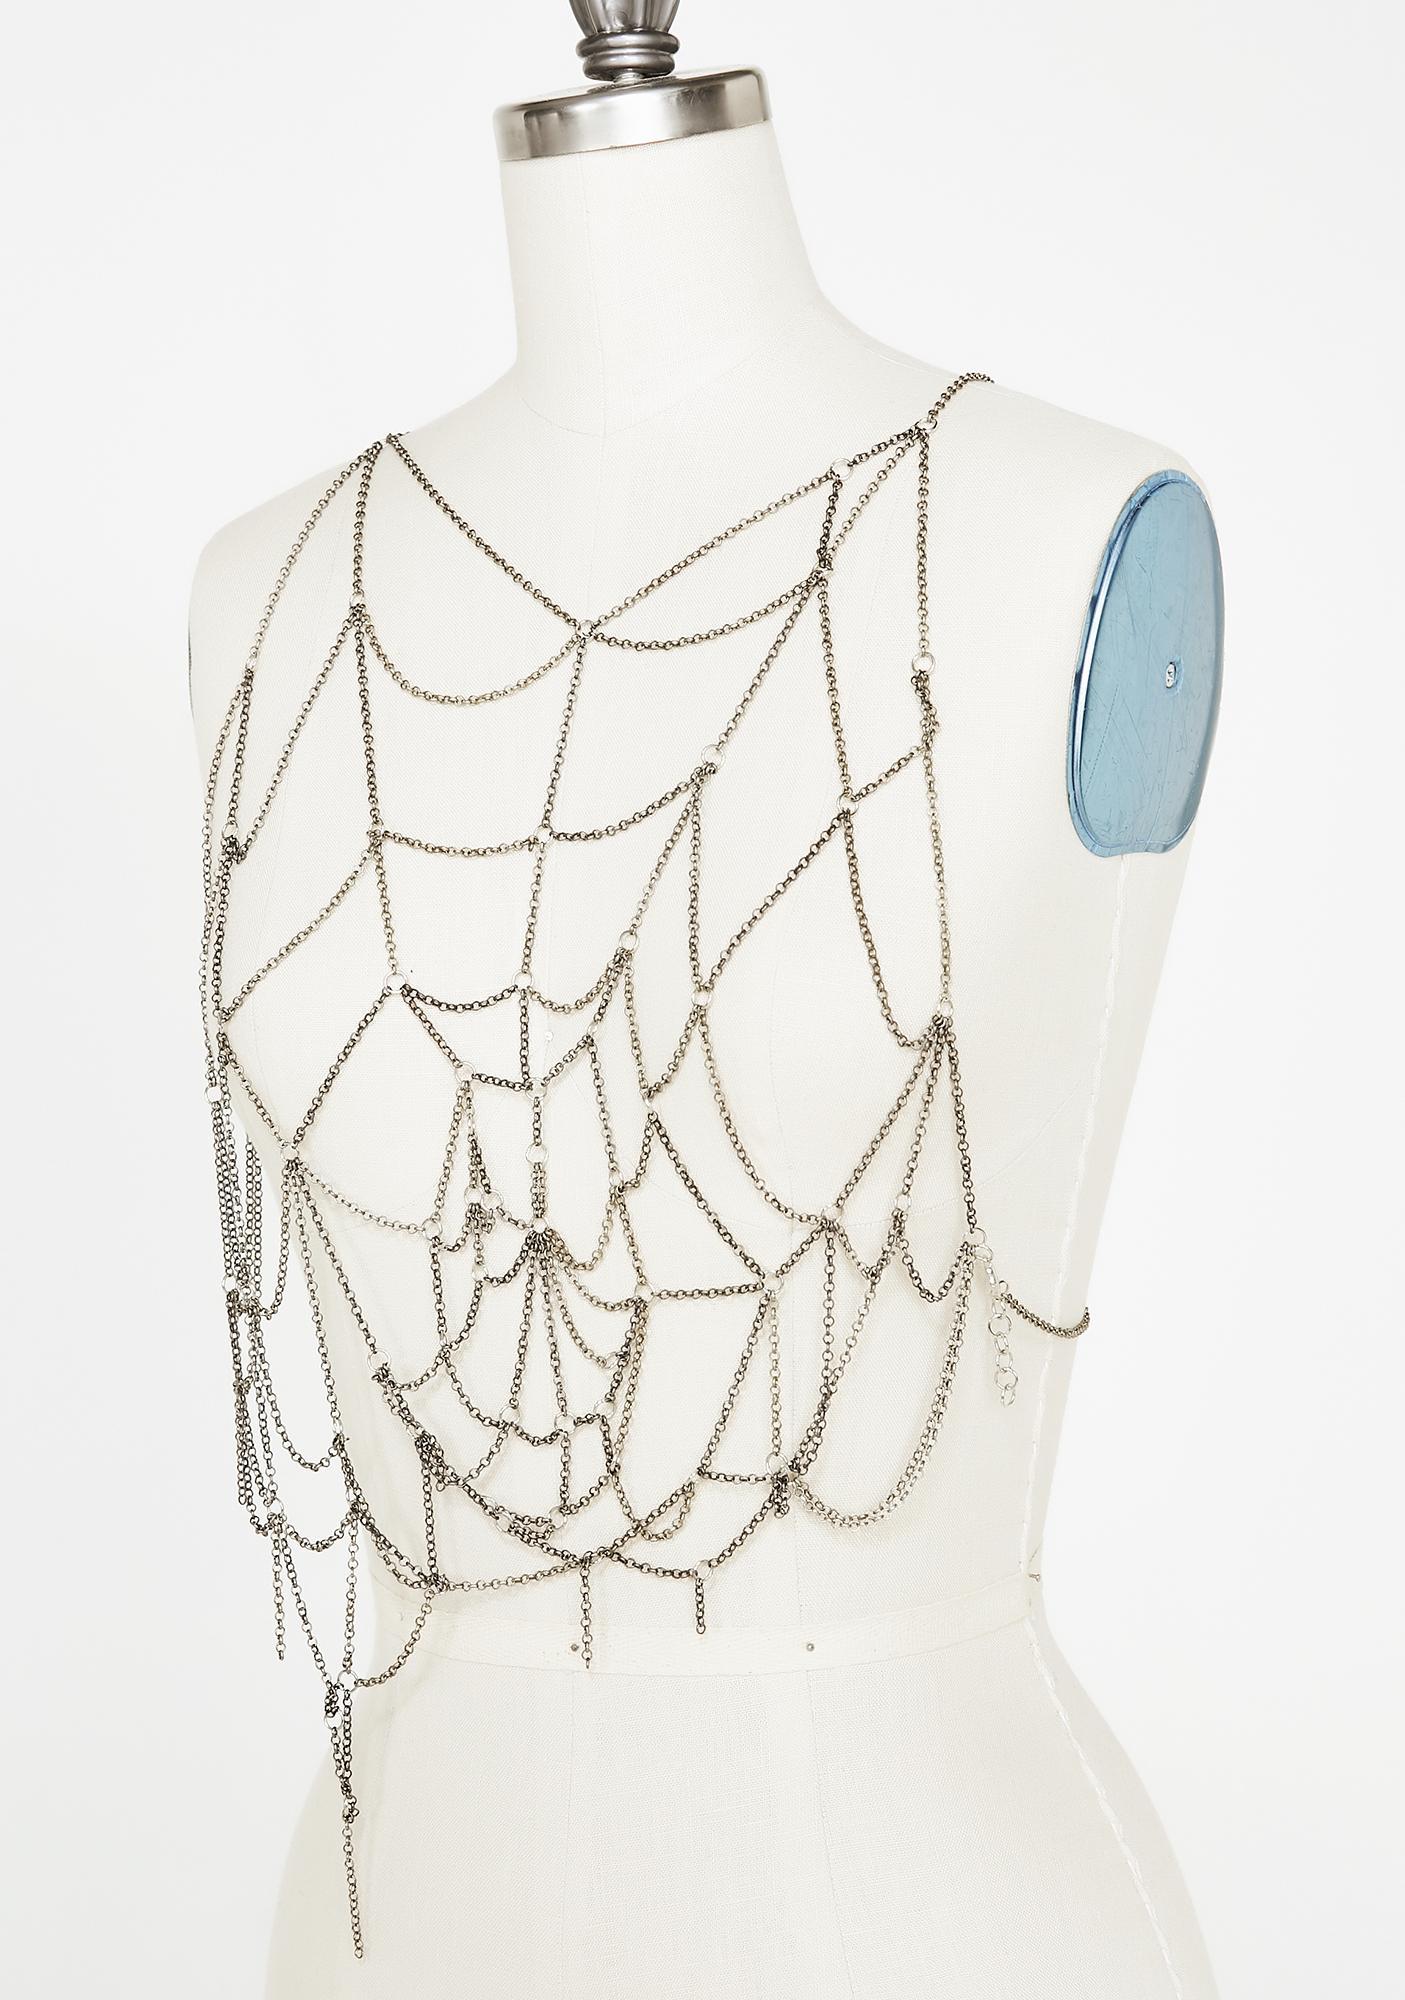 Walk Into My Web Body Chain